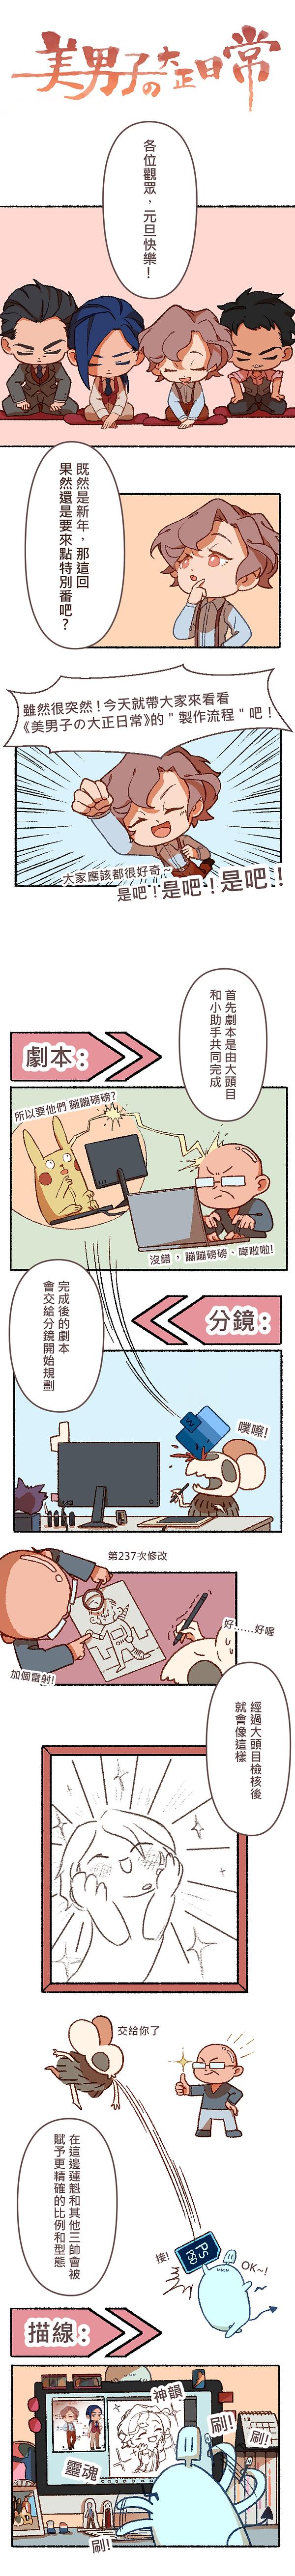 12 元旦特別篇-1.png